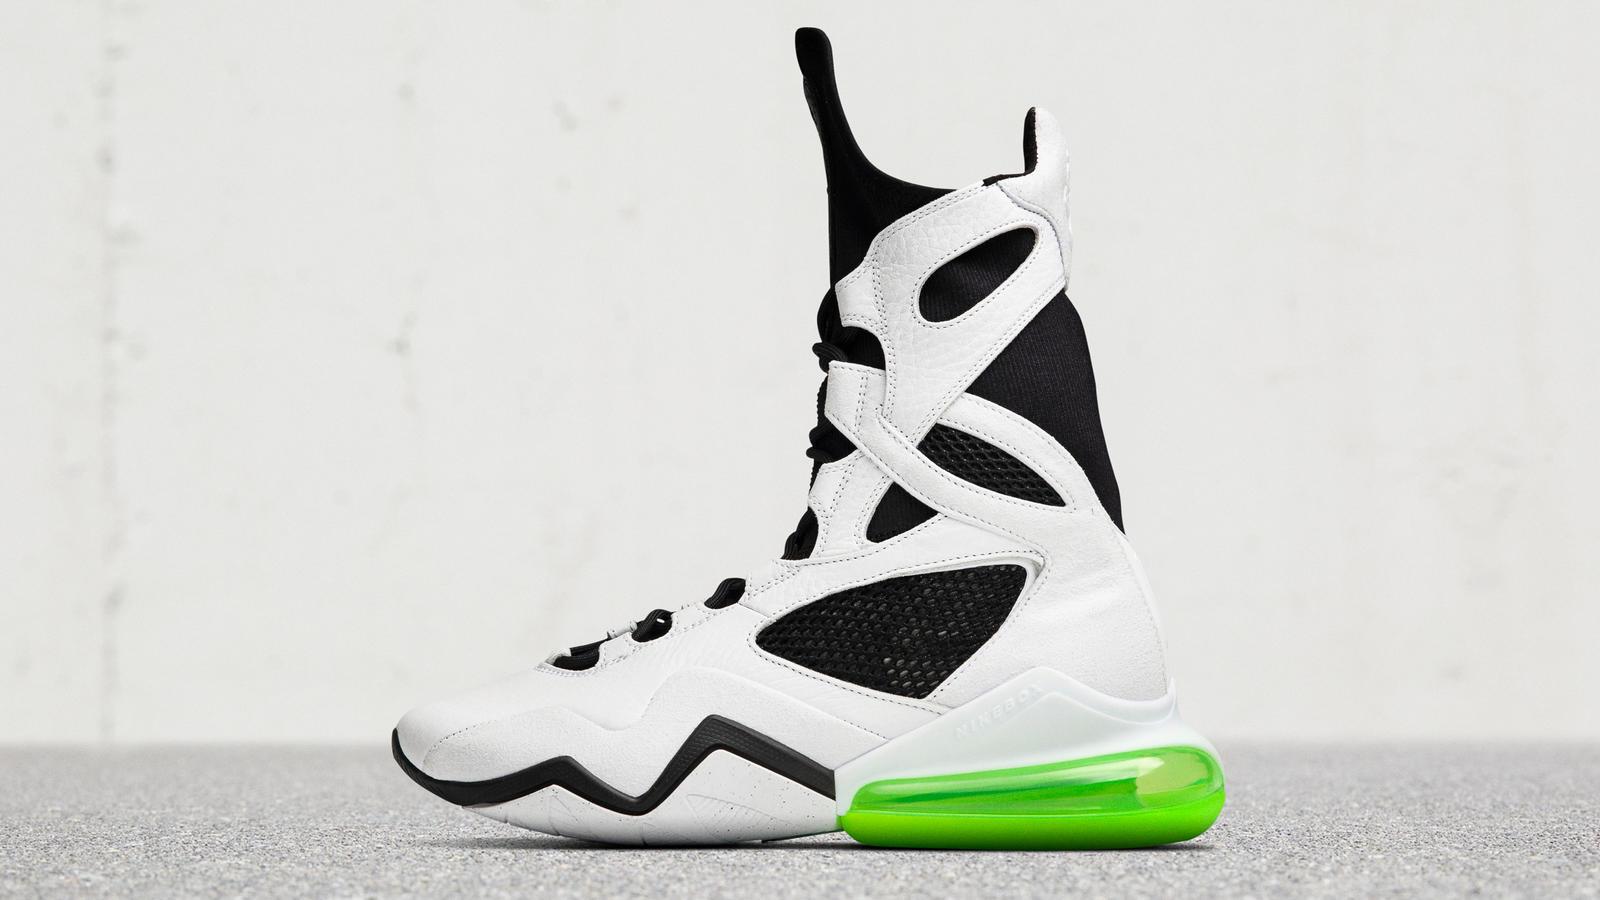 NikeNews_NikeWomens_NikeAirMaxBox_1_88961.jpg